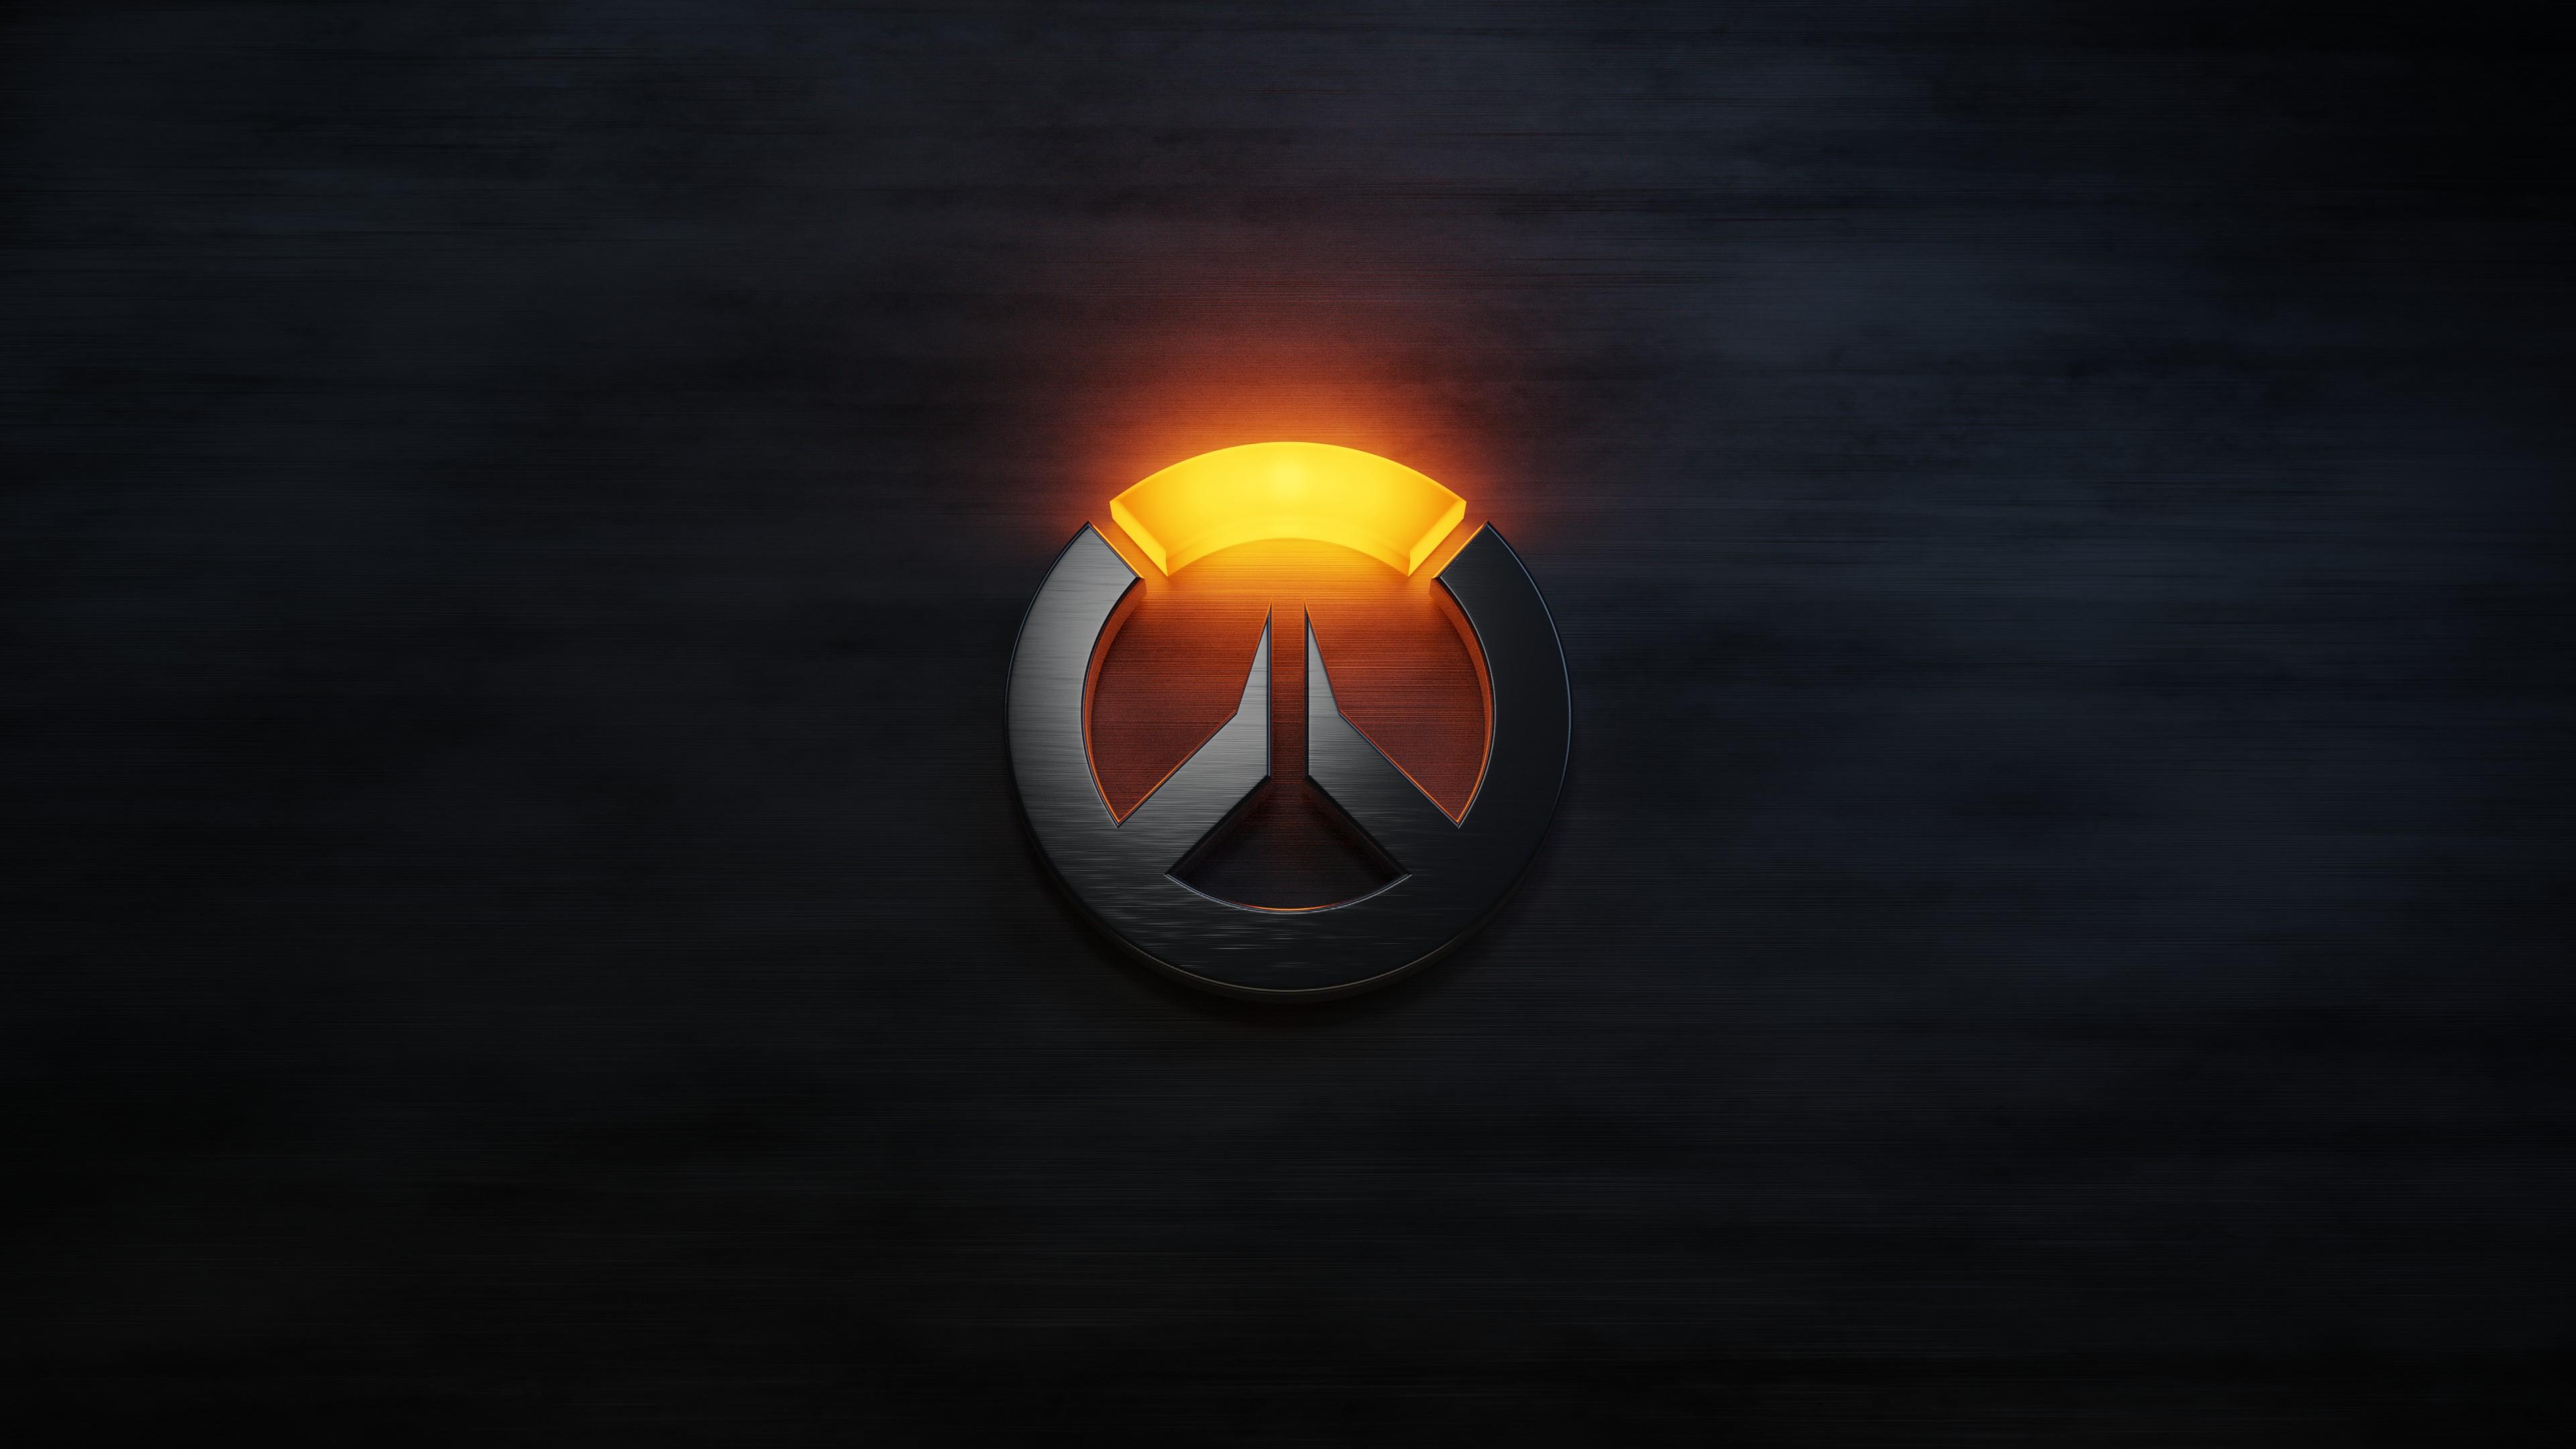 Overwatch Logo Wallpaper 4k By Nxsvinyard On Deviantart